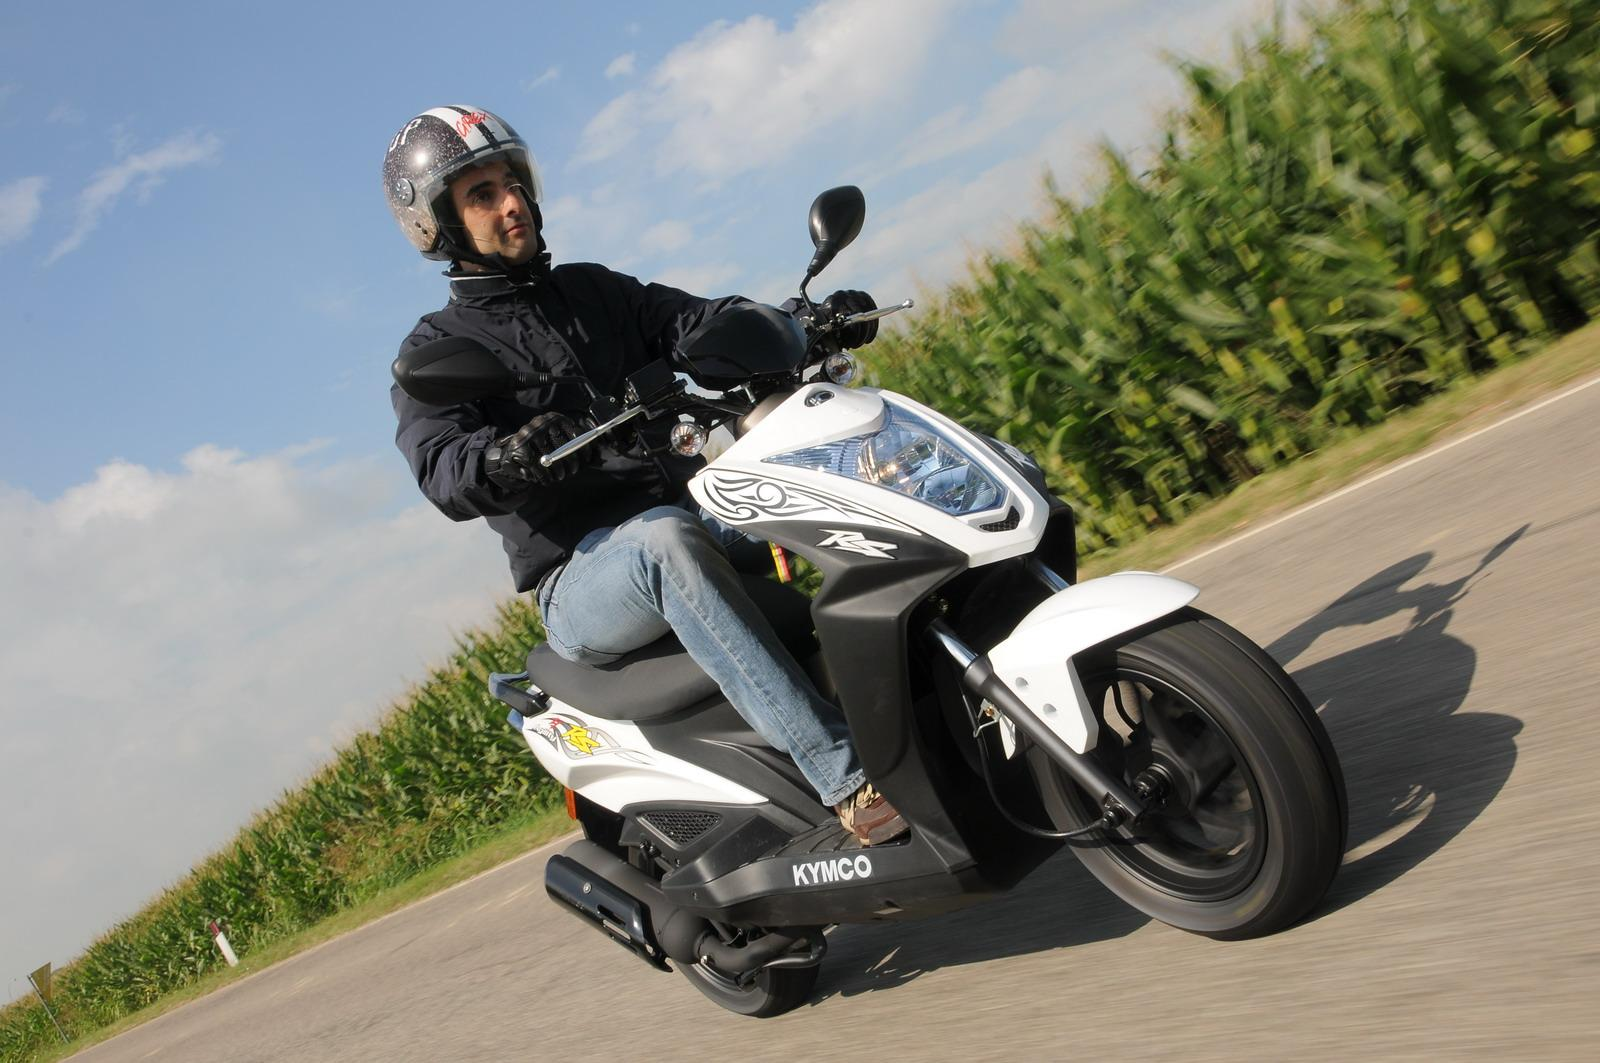 Présentation de la scooter 50 Kymco Agility 50 Naked Renouvo